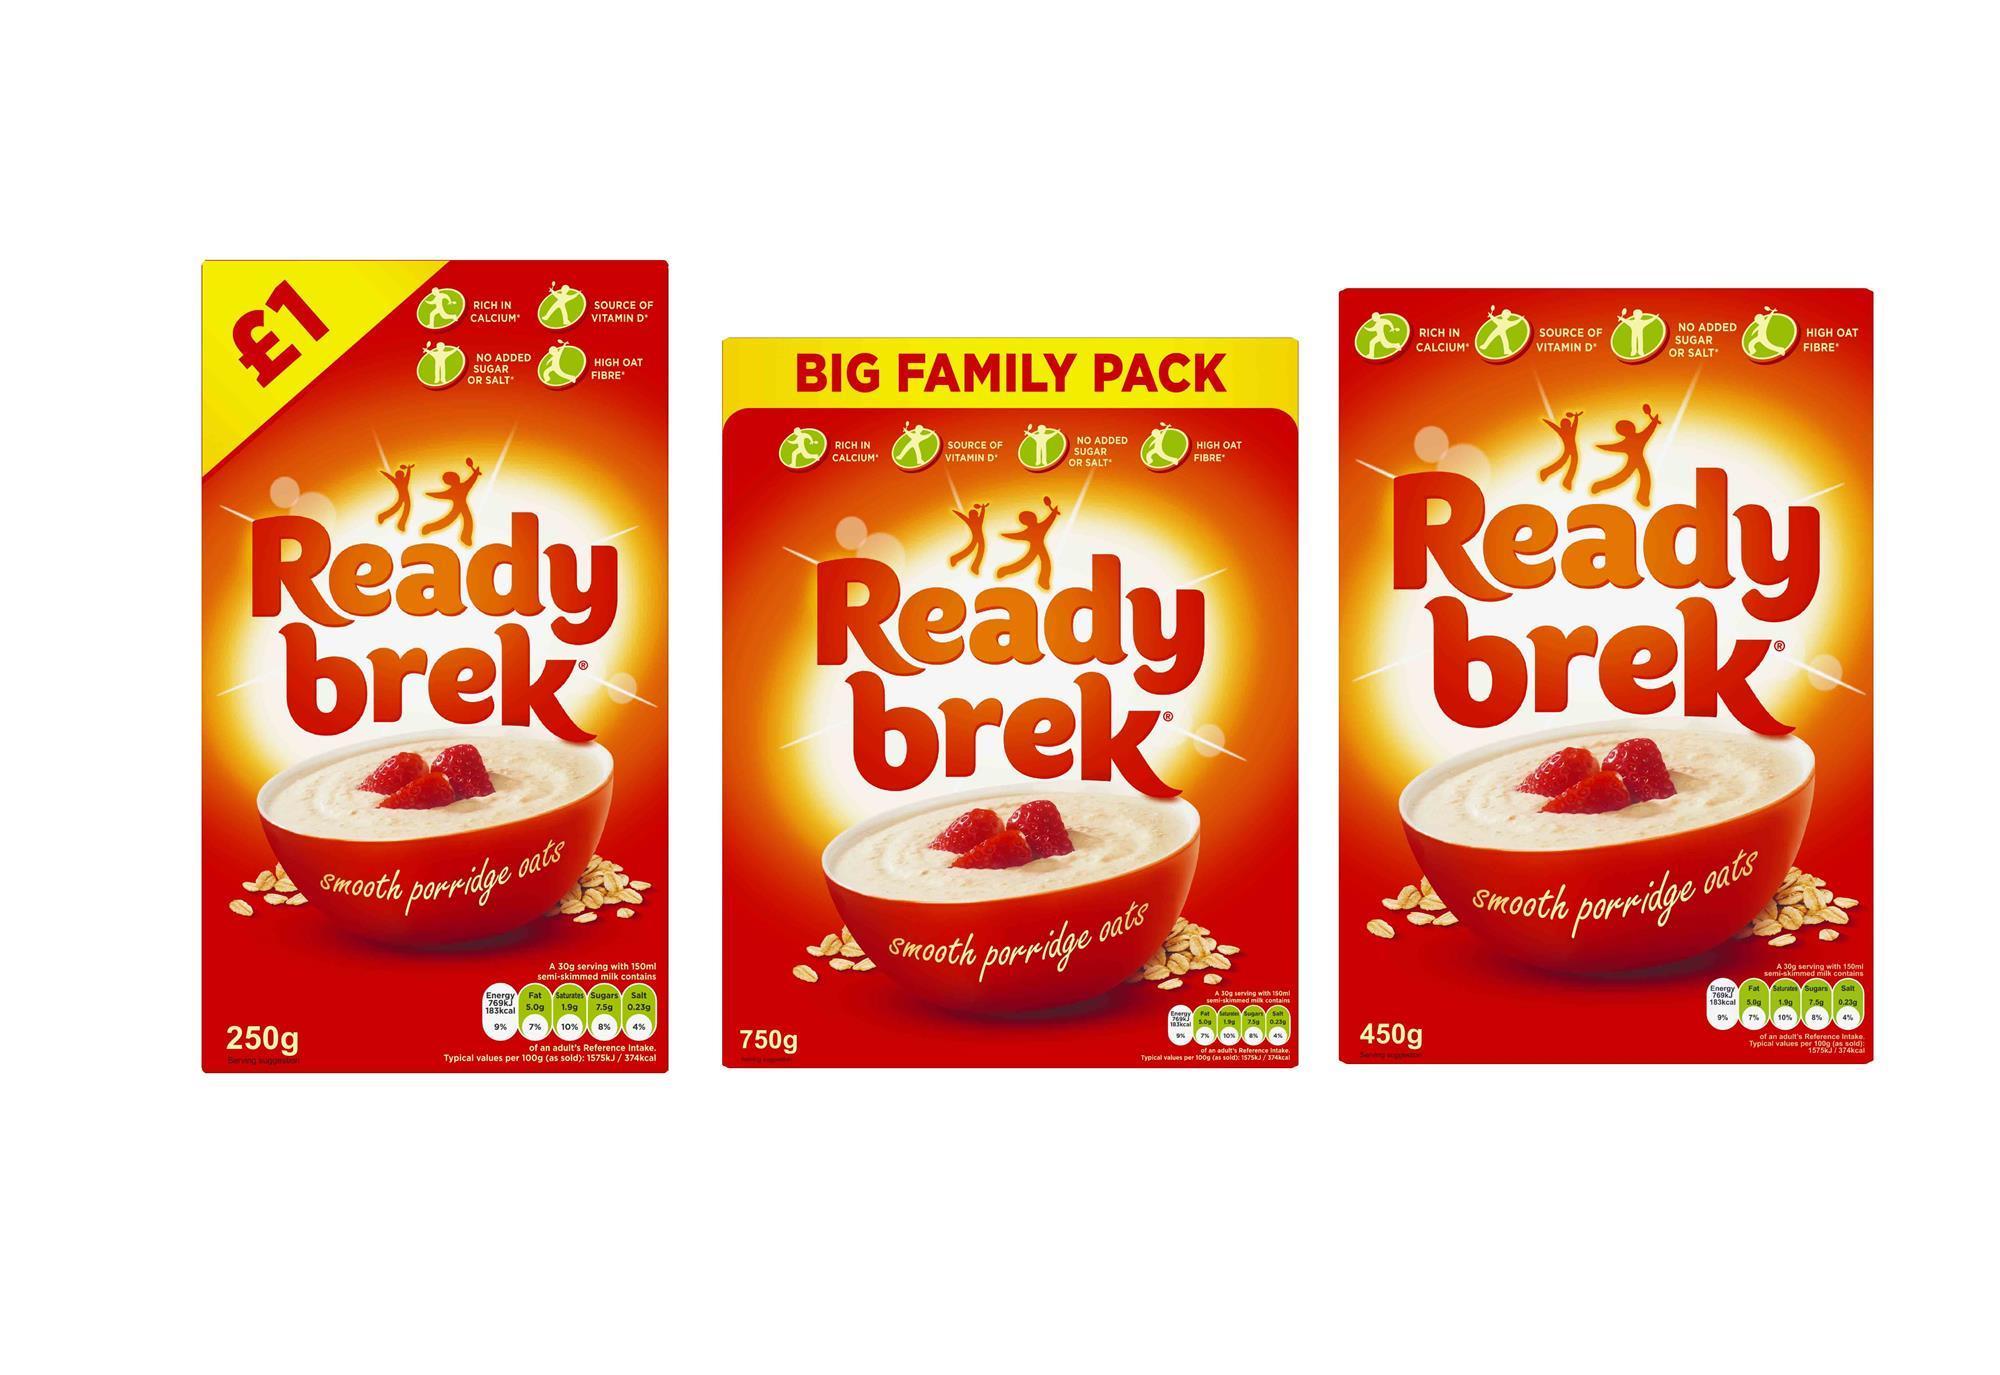 Ready Brek Gets Retro Pack Refresh Product News